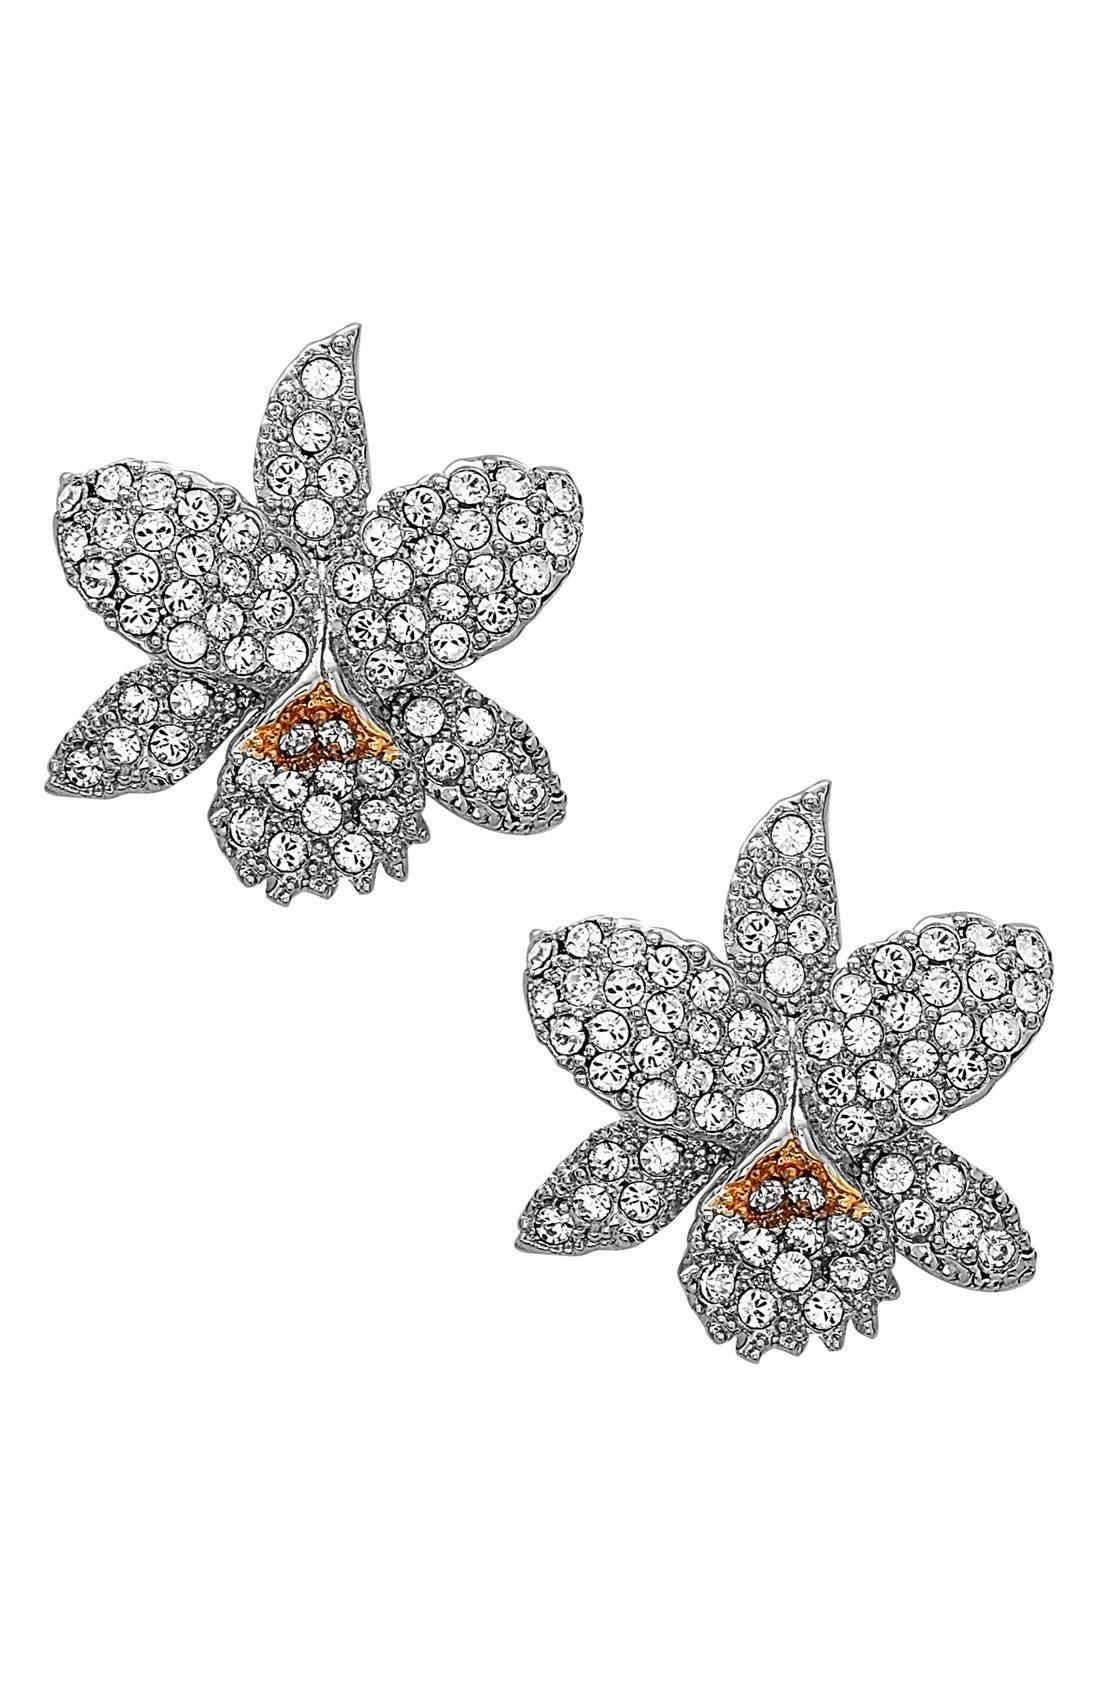 Floral Crystal Stud Earrings,                             Main thumbnail 1, color,